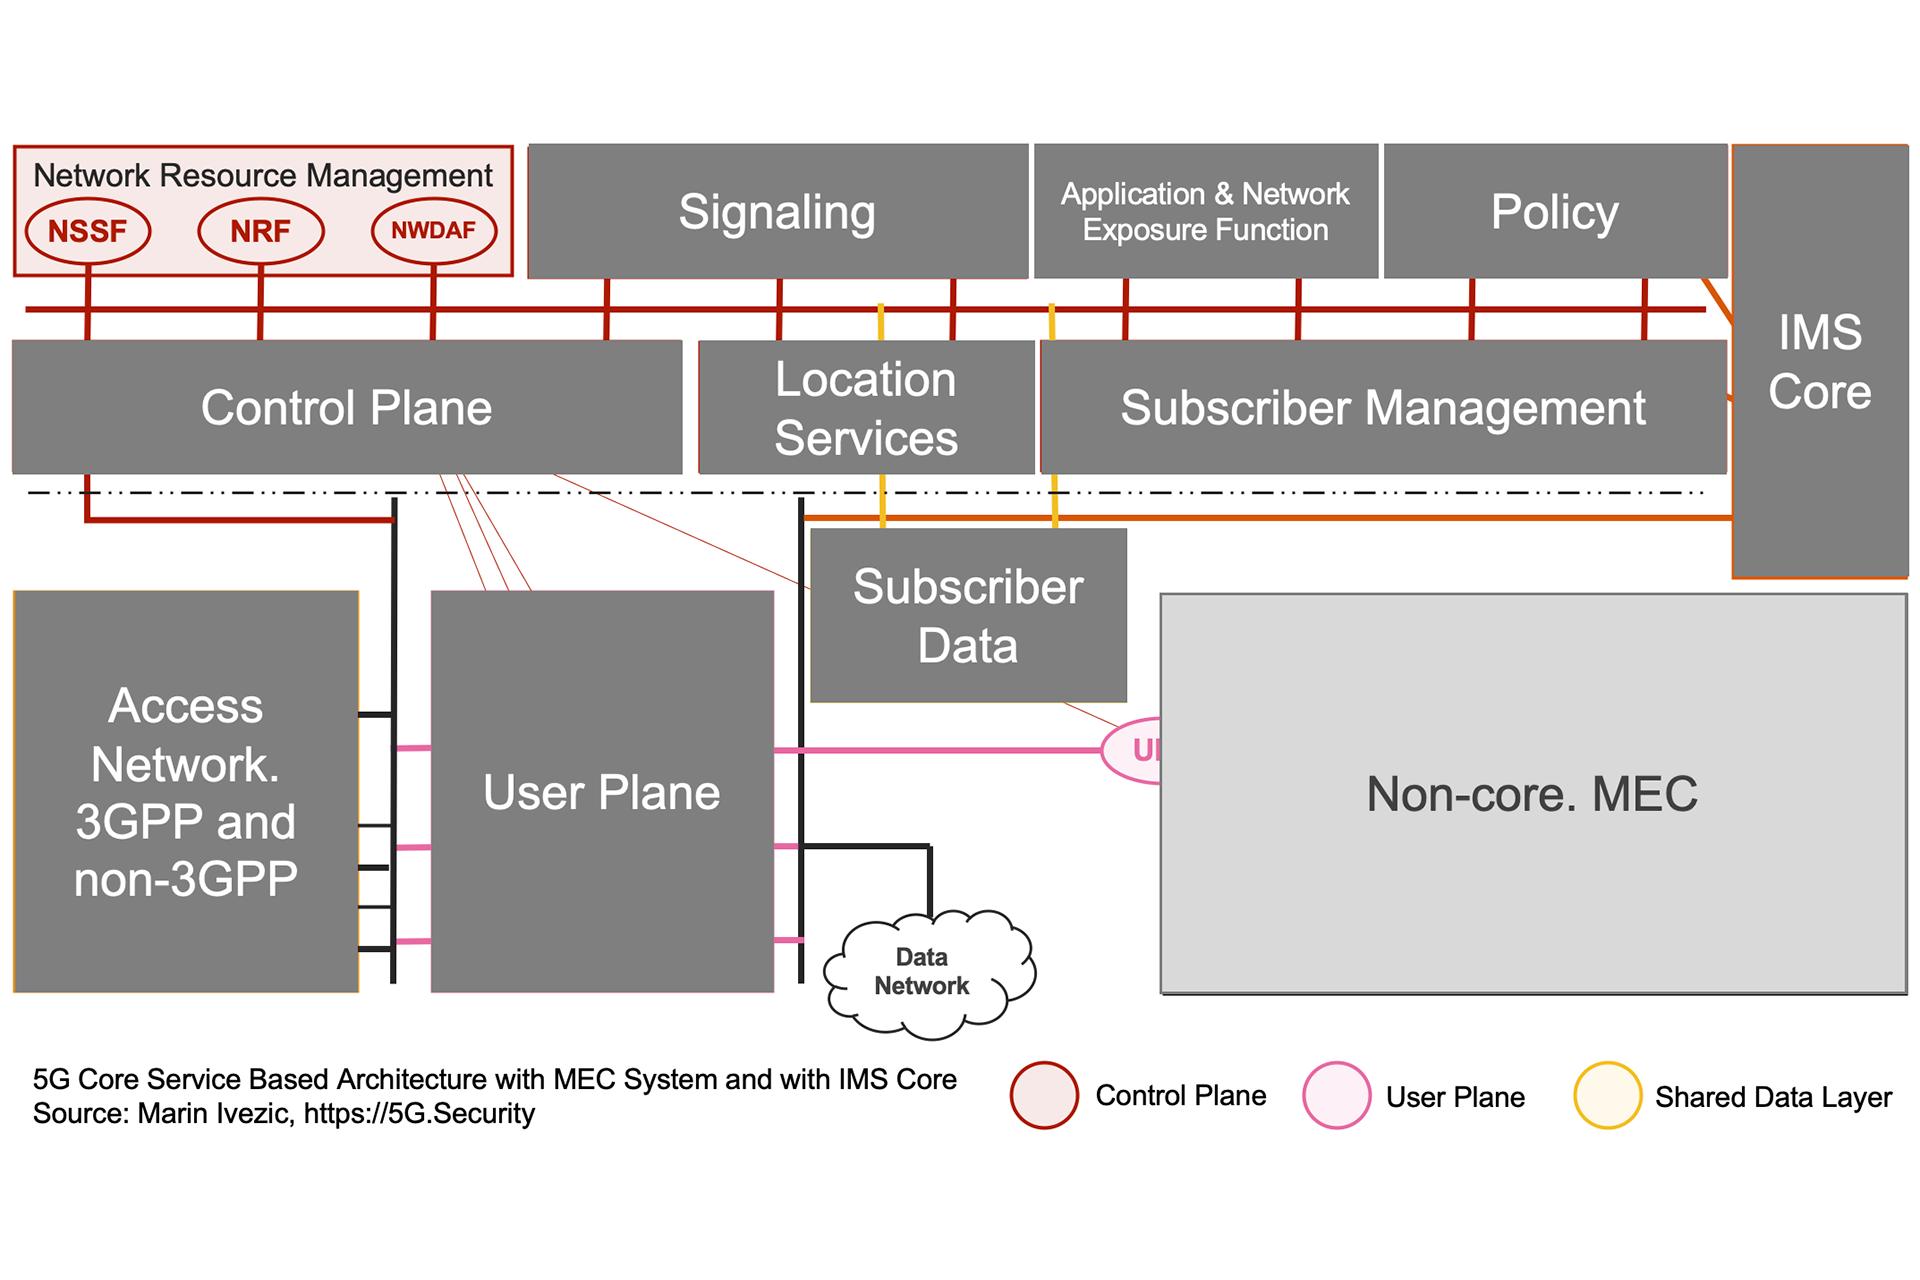 5G SBA IMS MEC Architecture - Network Resources Management